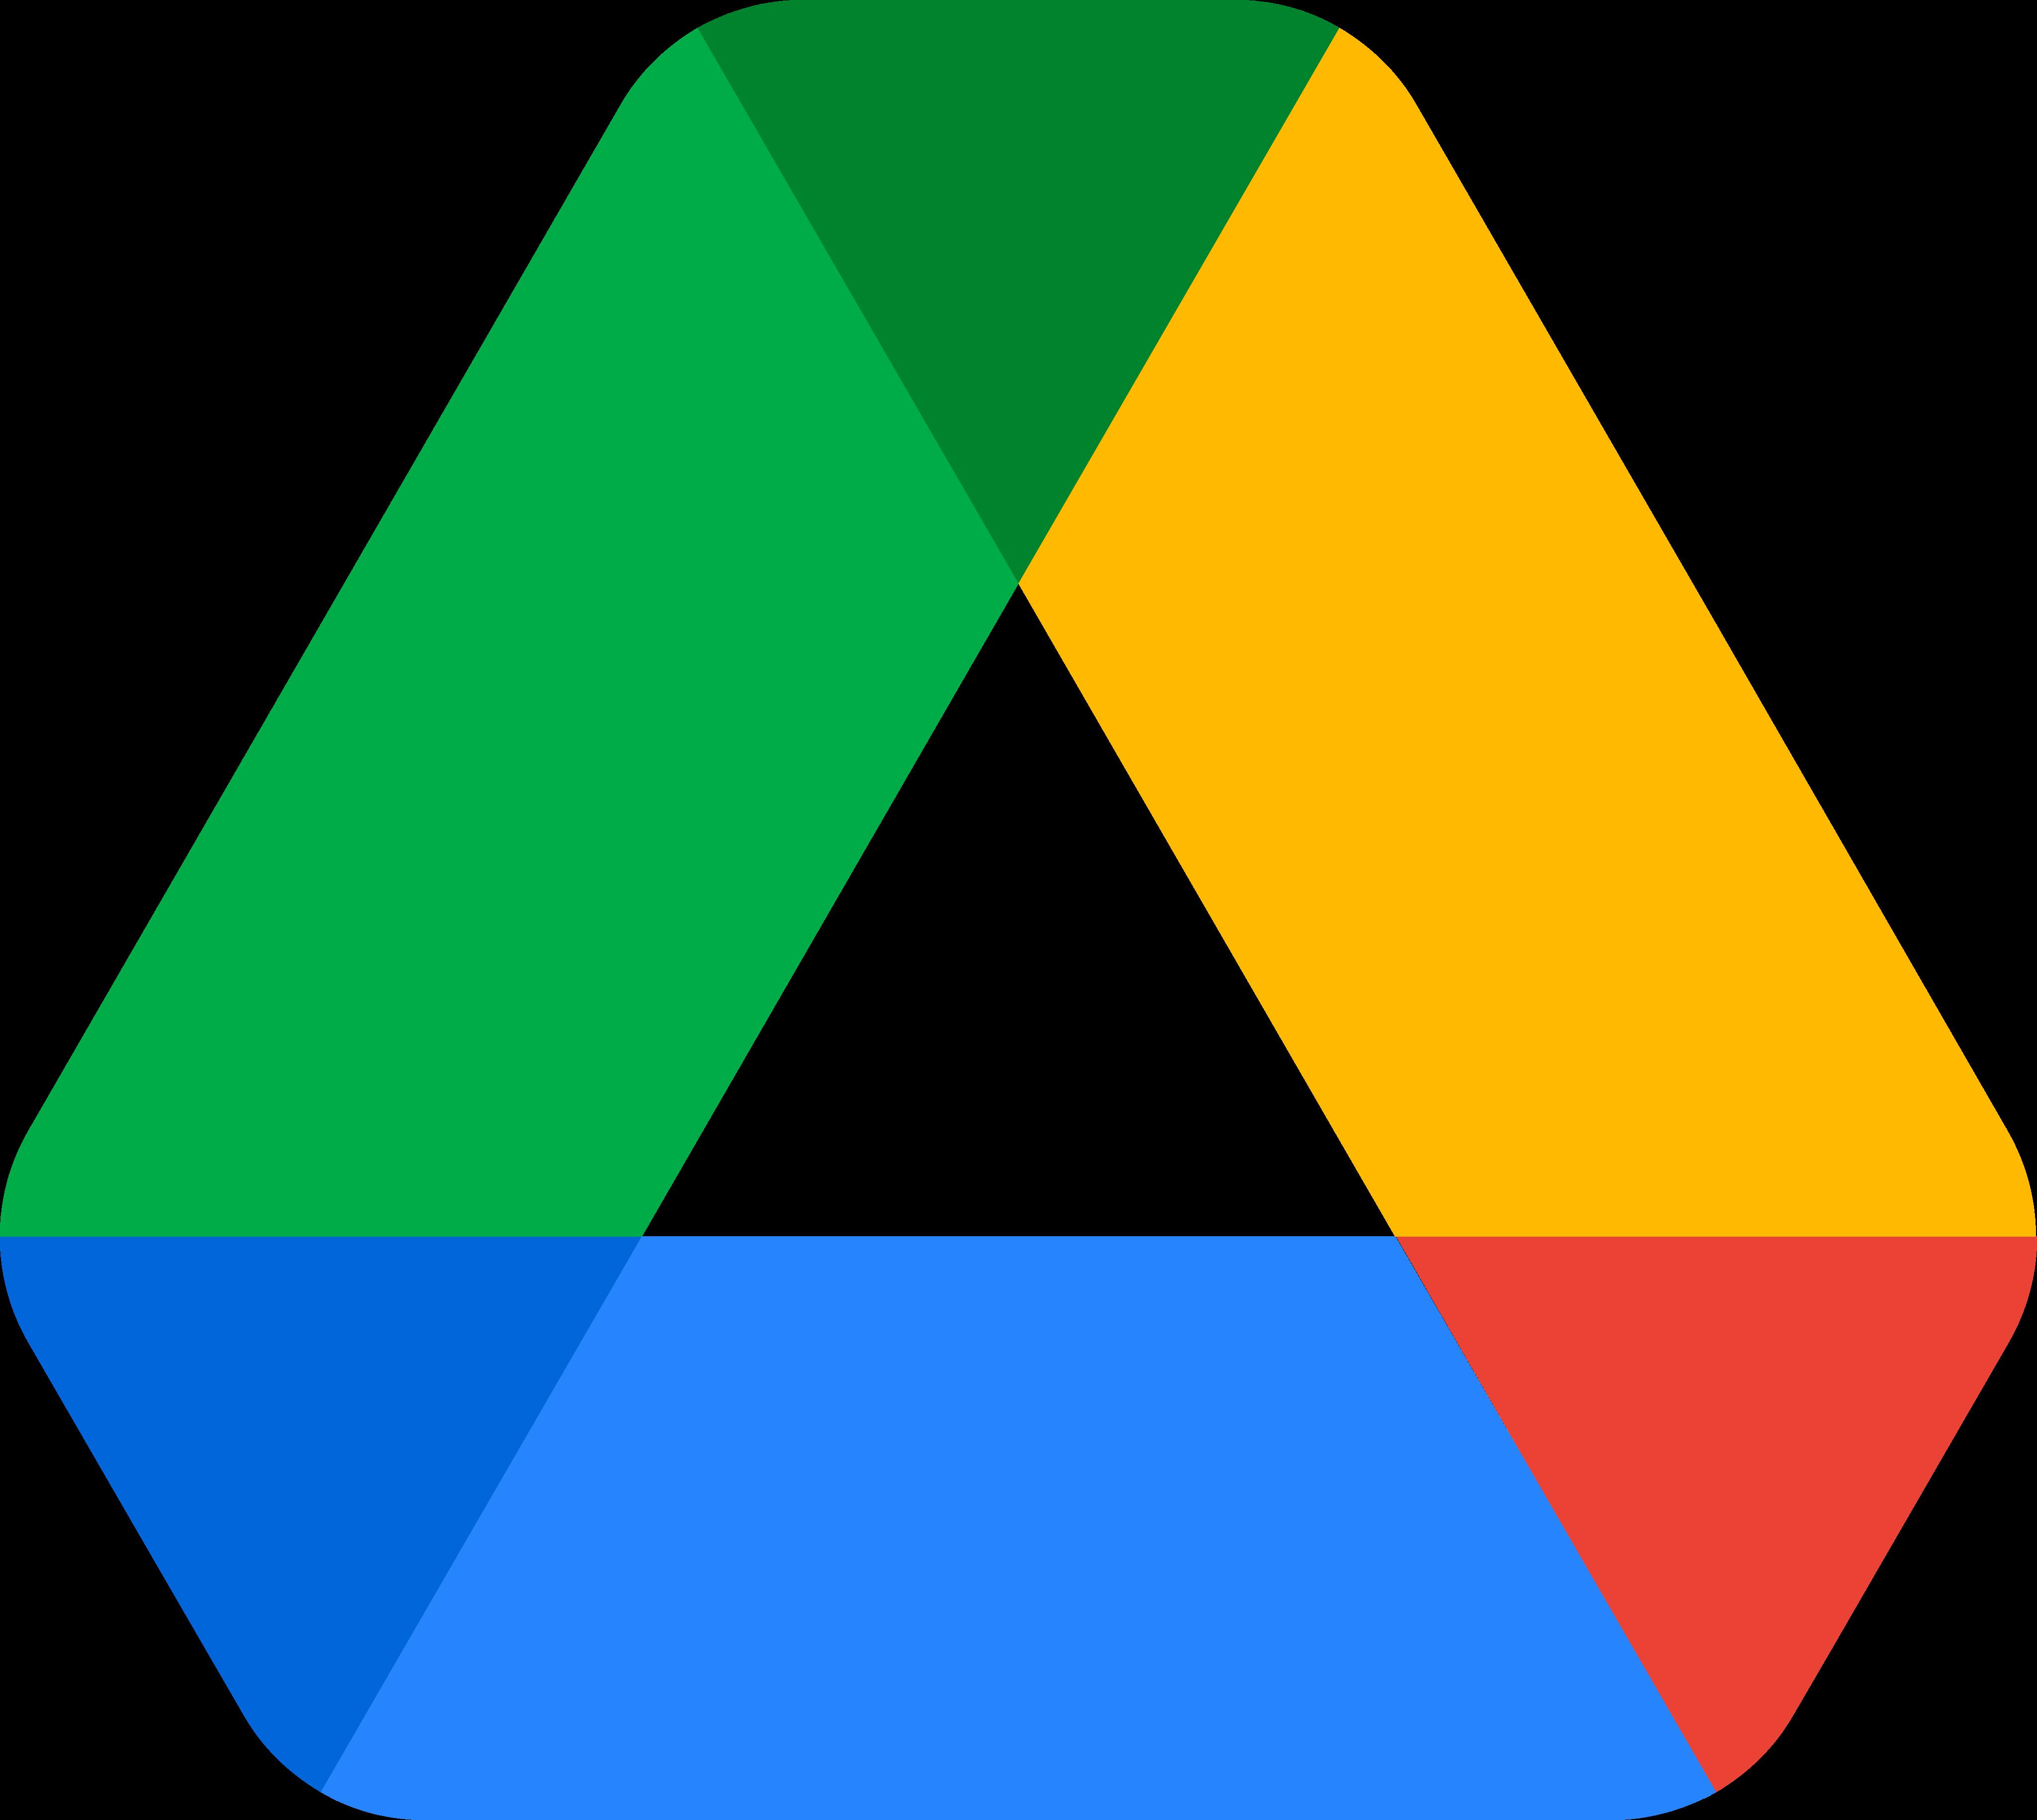 google drive logo 1 1 - Google Drive Logo